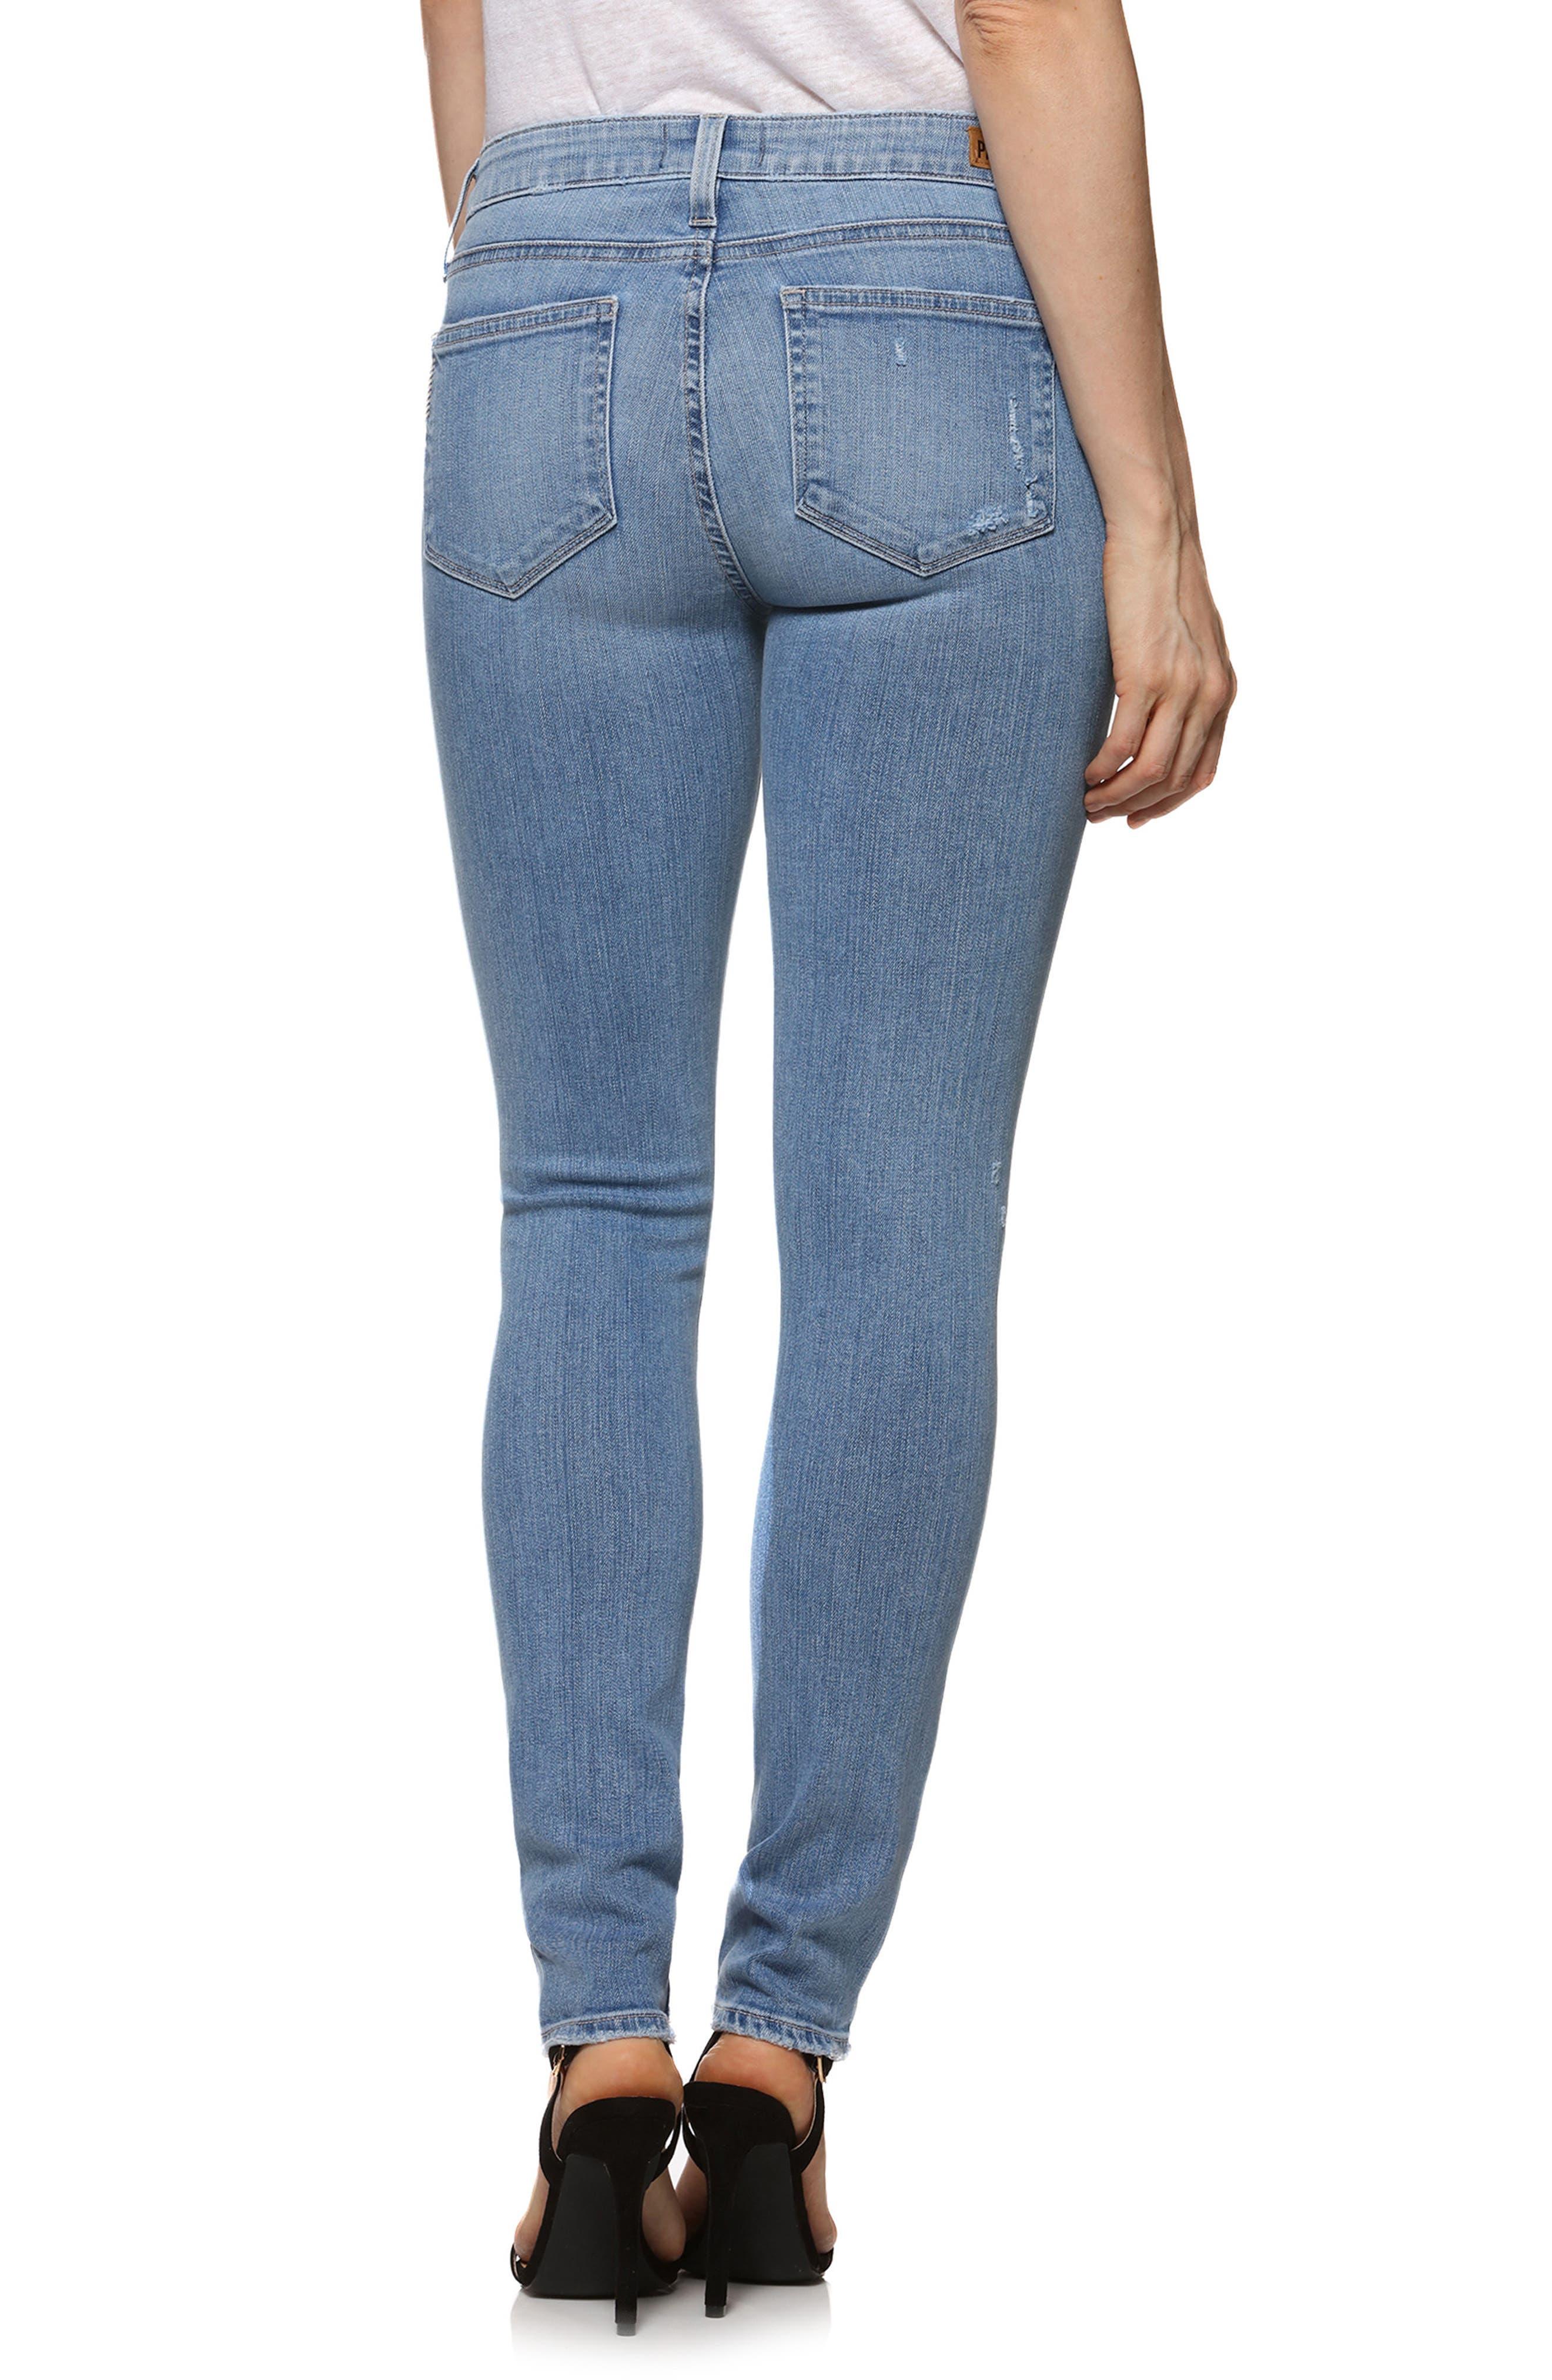 Skyline Ankle Skinny Jeans,                             Alternate thumbnail 2, color,                             Soto